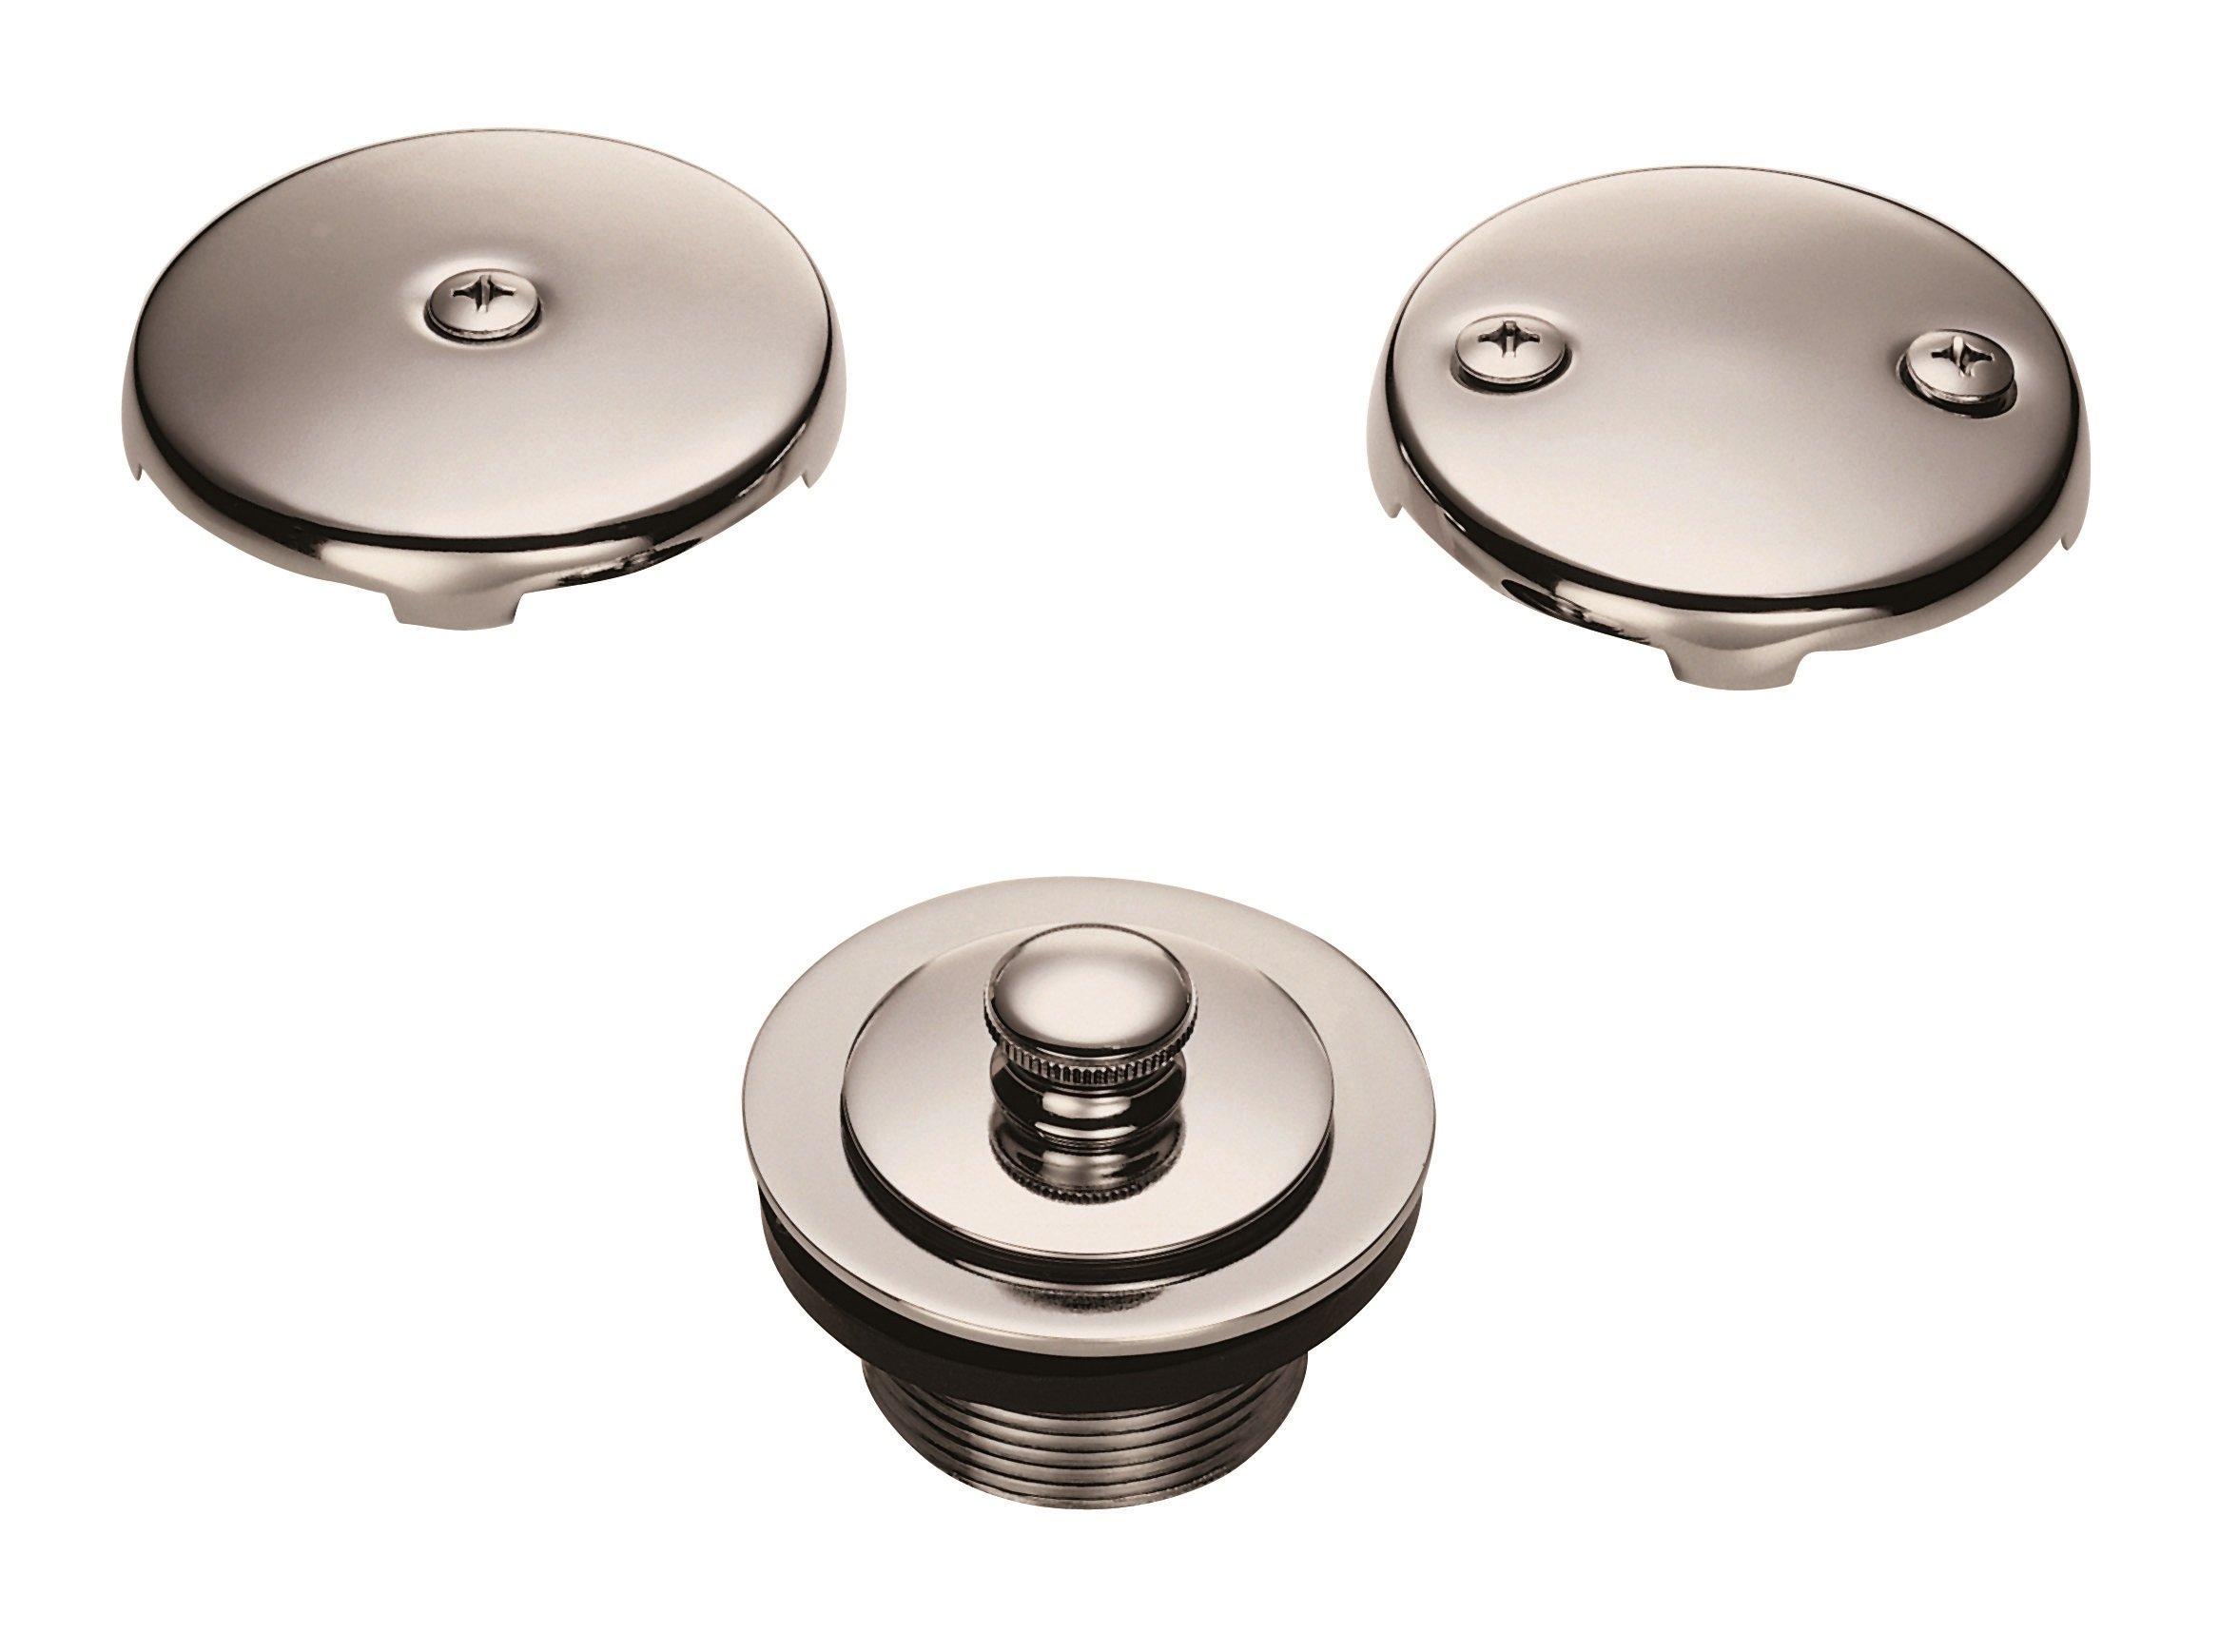 Danze D490637BN Lift and Turn Bath Drain Conversion Kit, Brushed Nickel